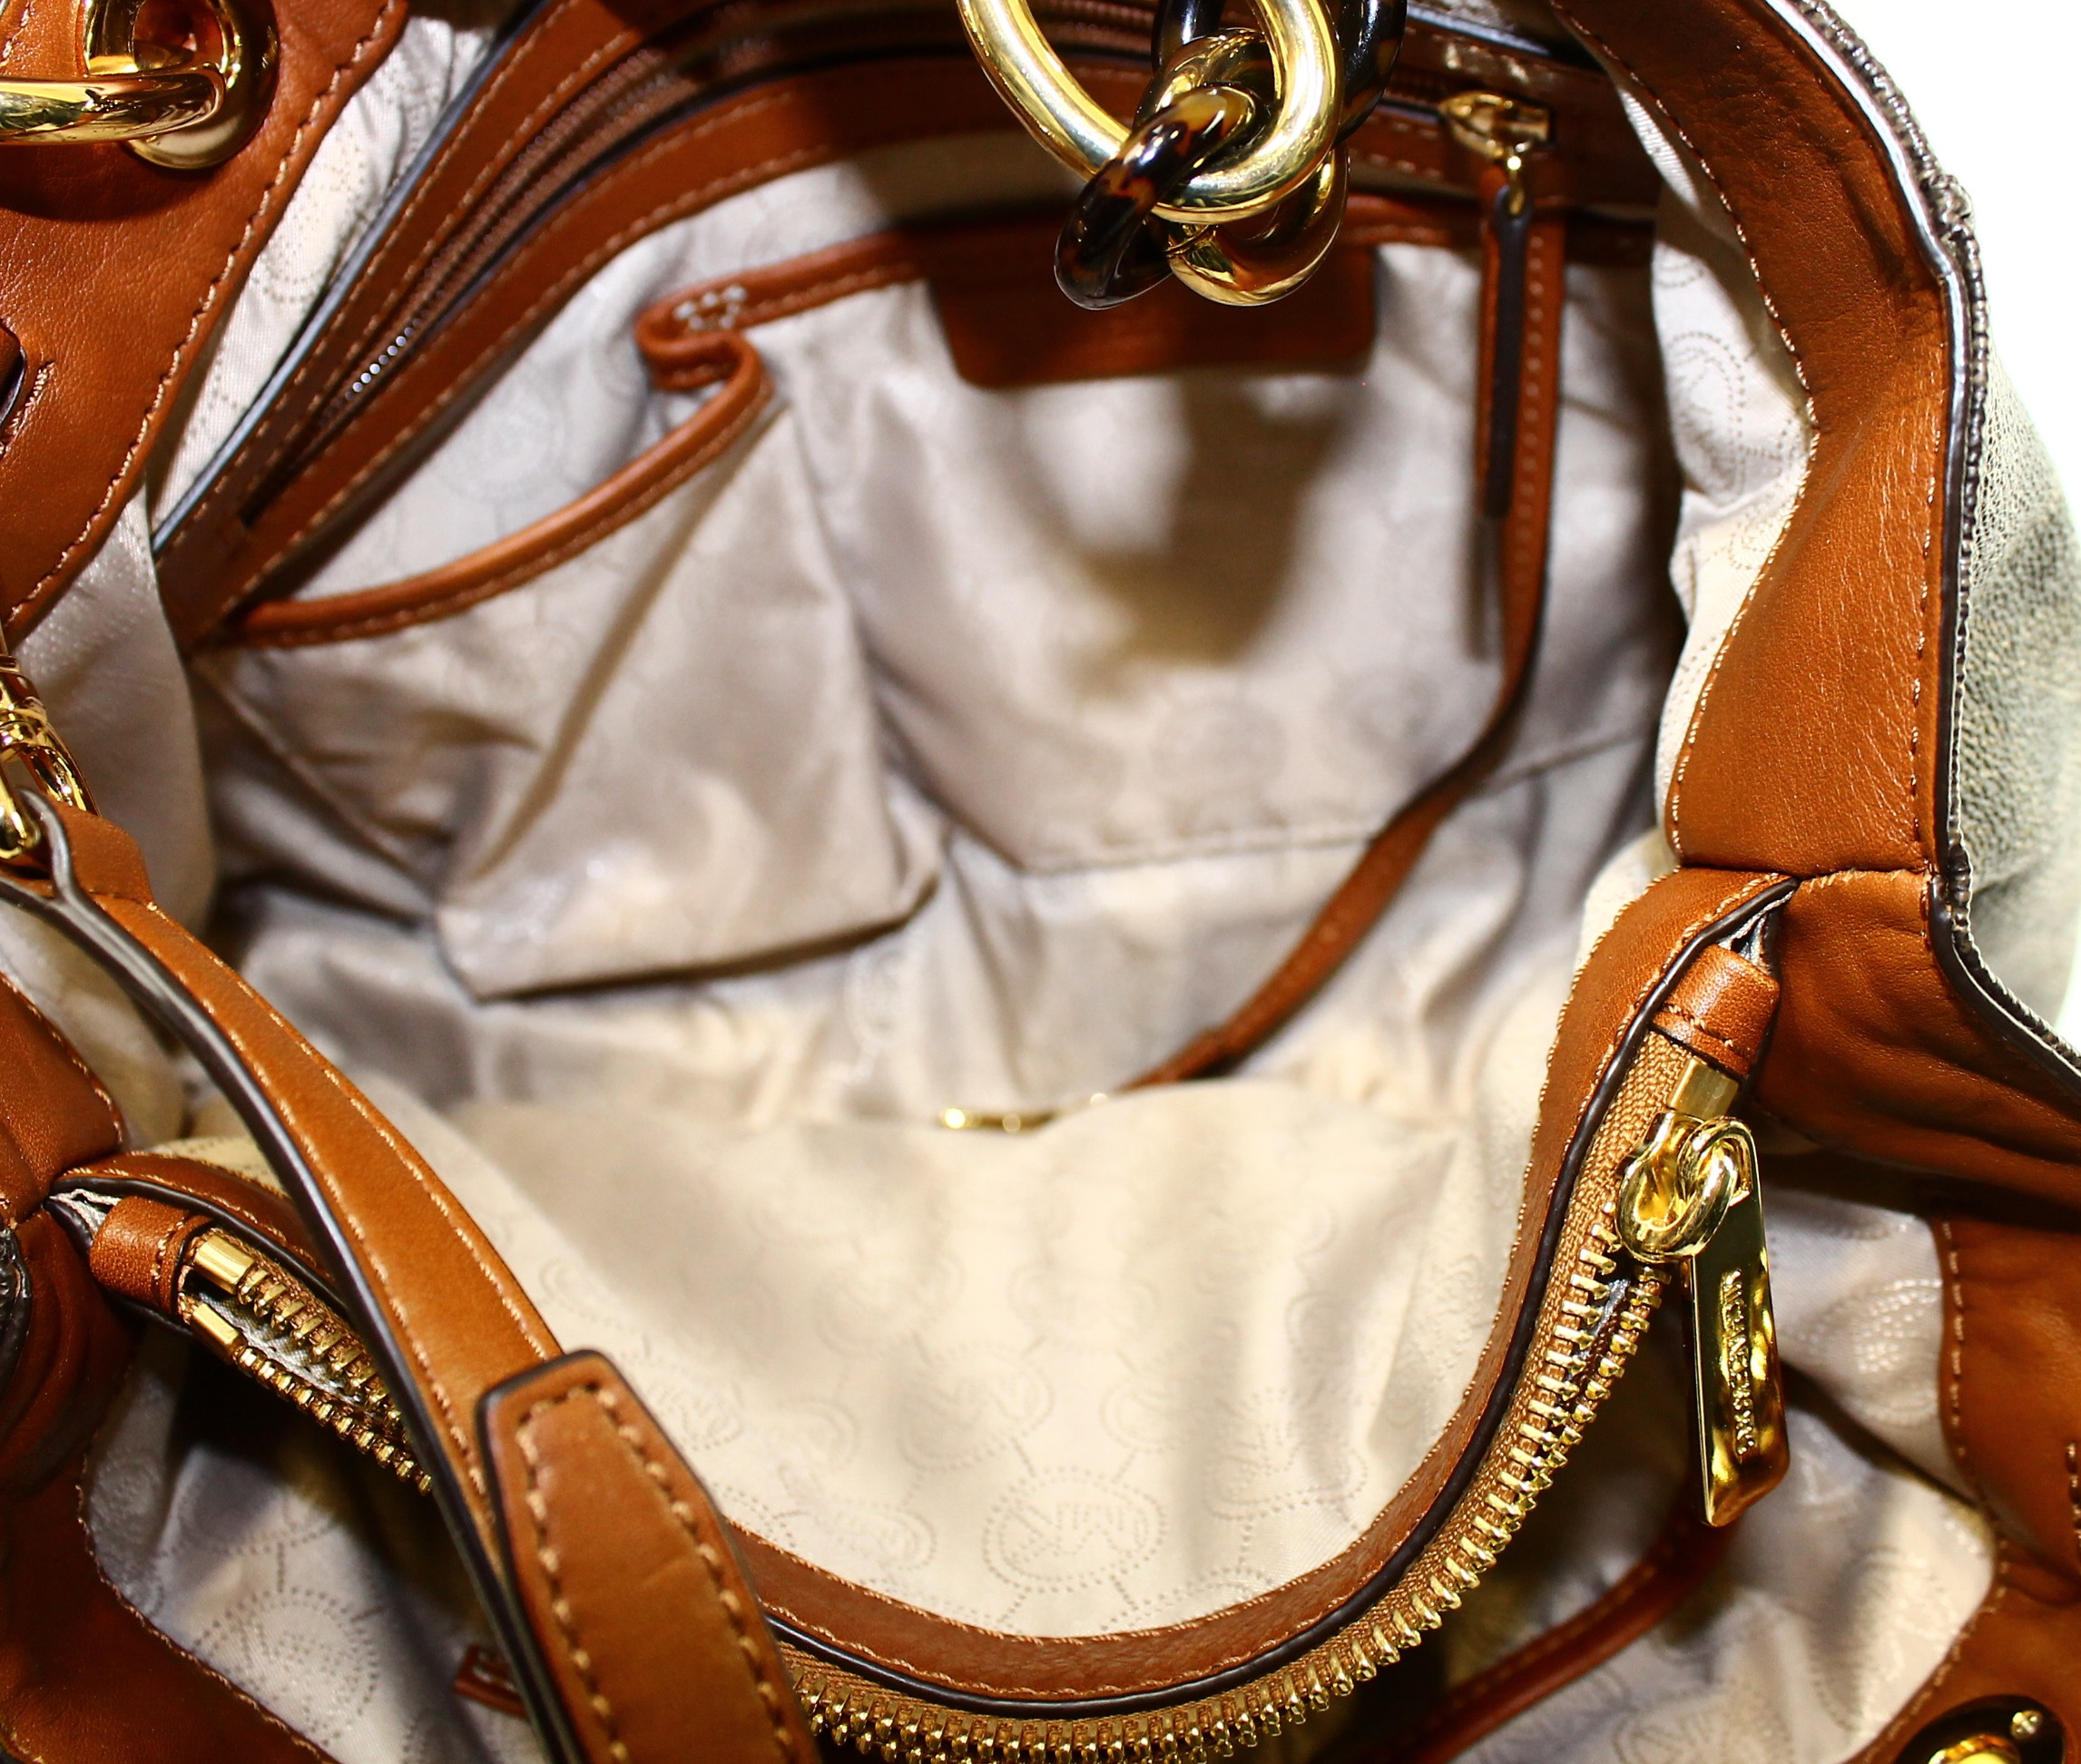 4e7283205f36 ... spain michael kors cynthia signature medium satchel handbag brown  30s3tcys2b walmart 9a81a e833f